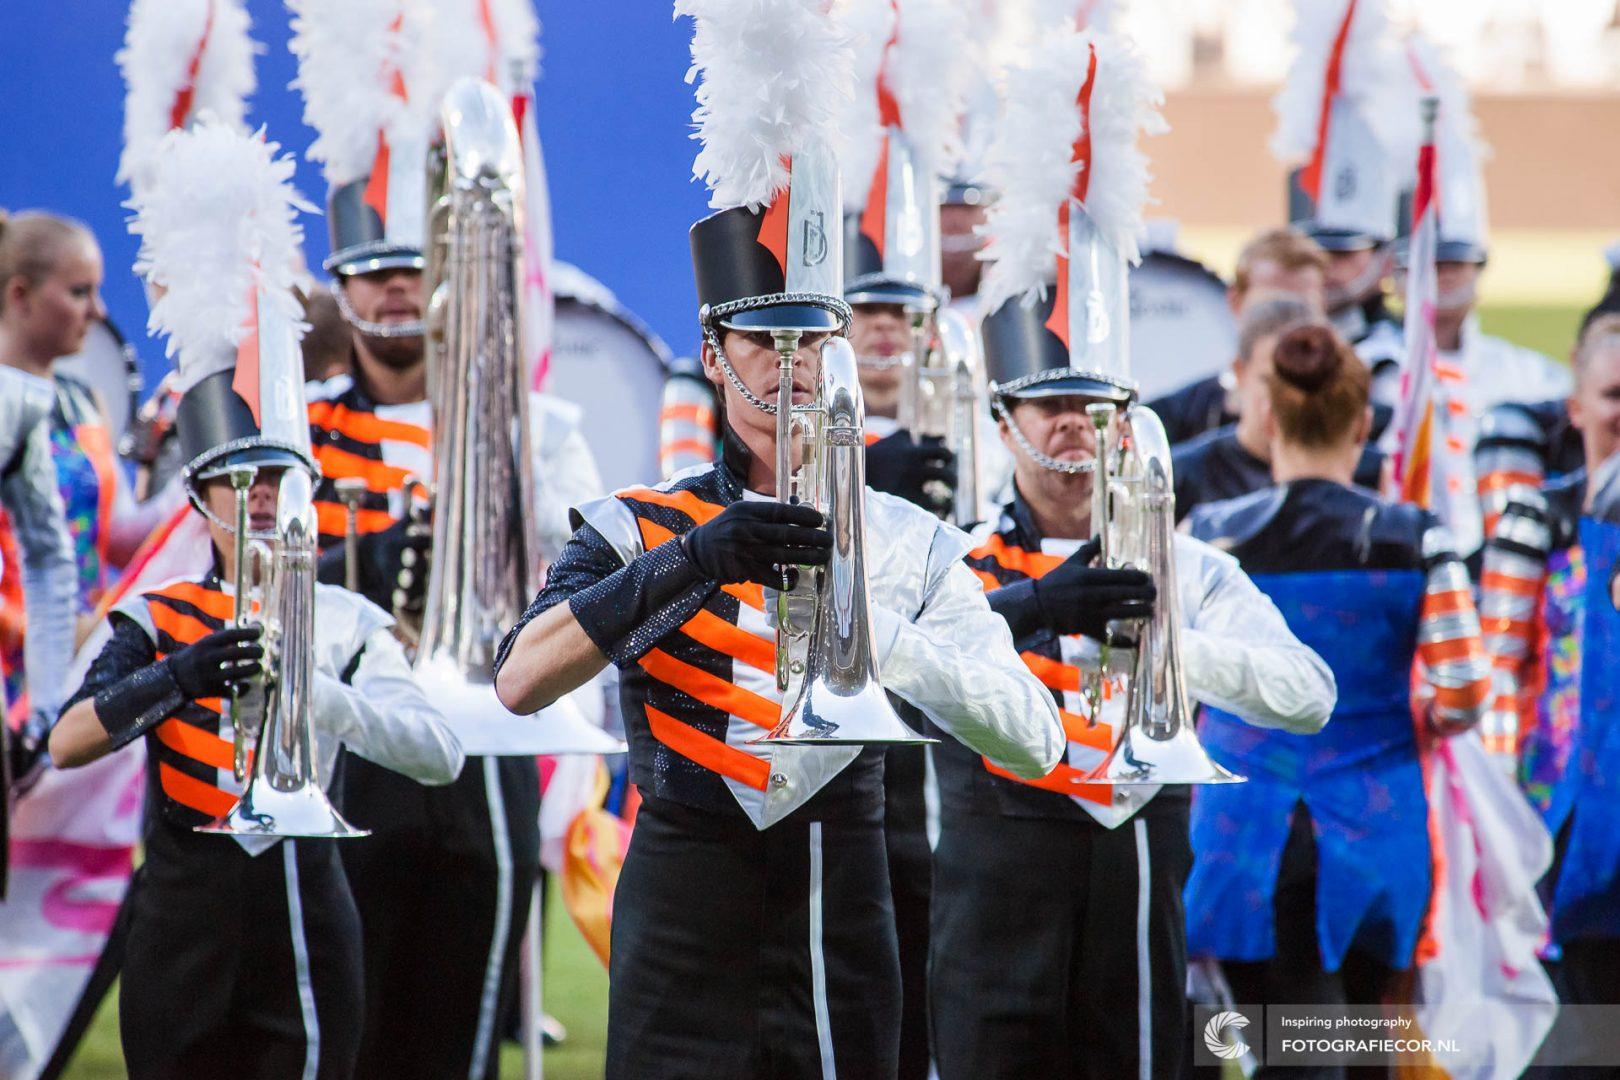 Event | Drumcore | Jubal | Dordrecht | muziek | showband | Taptoe | Korpsmuziek